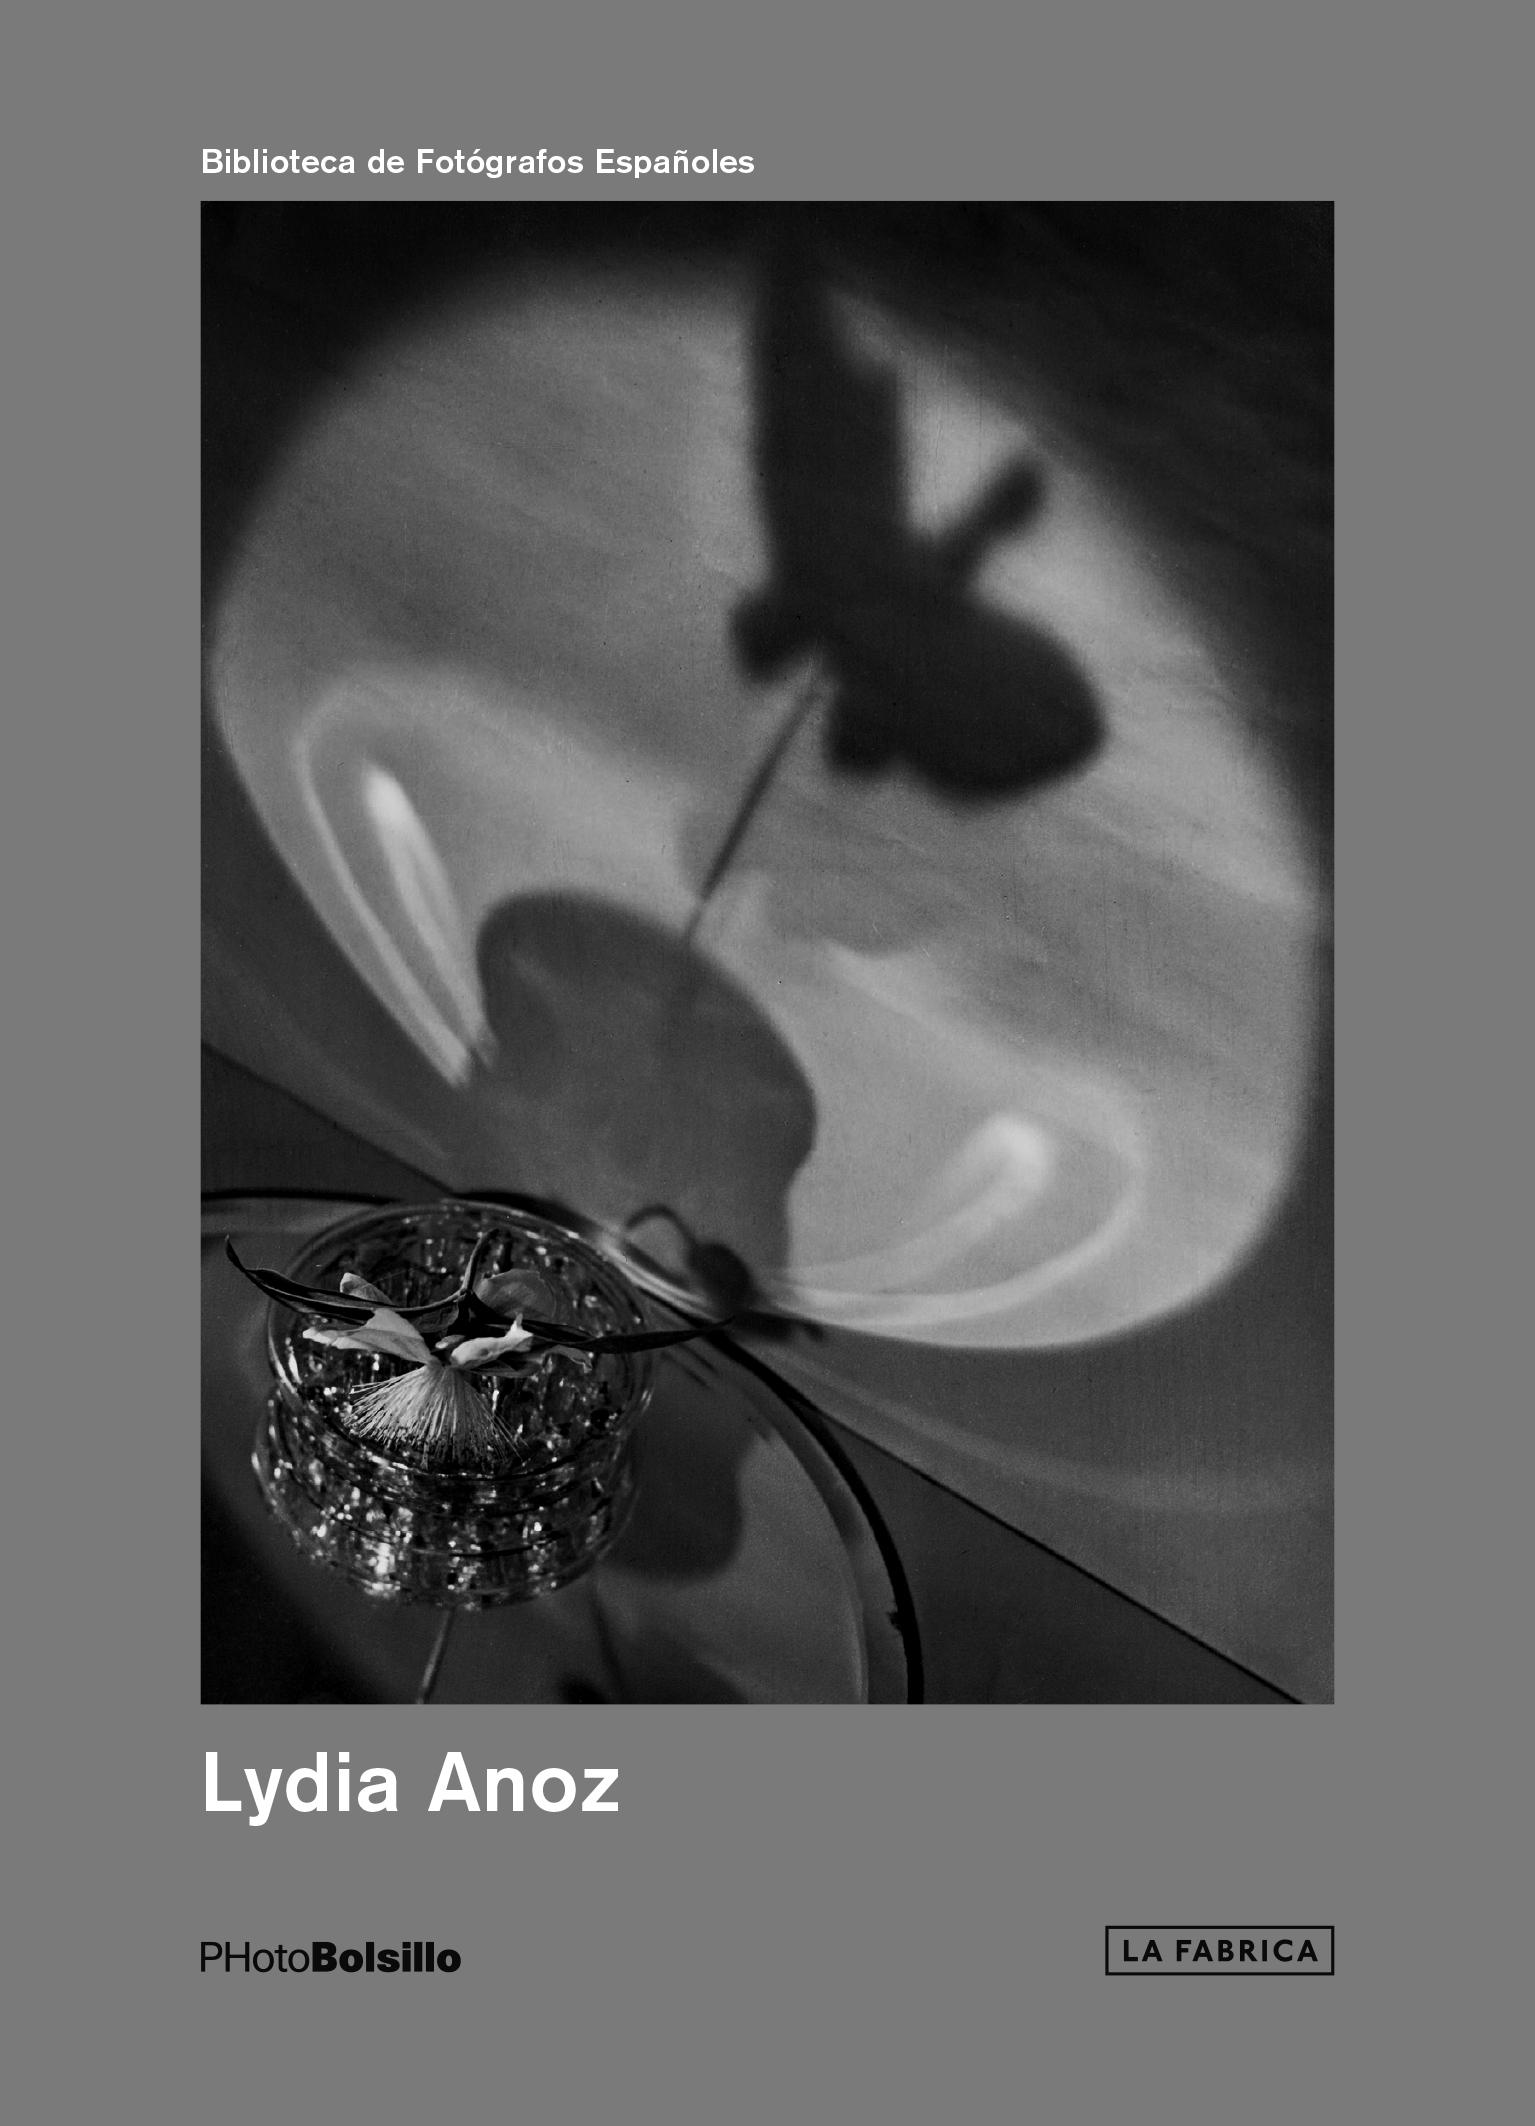 Lydia Anoz